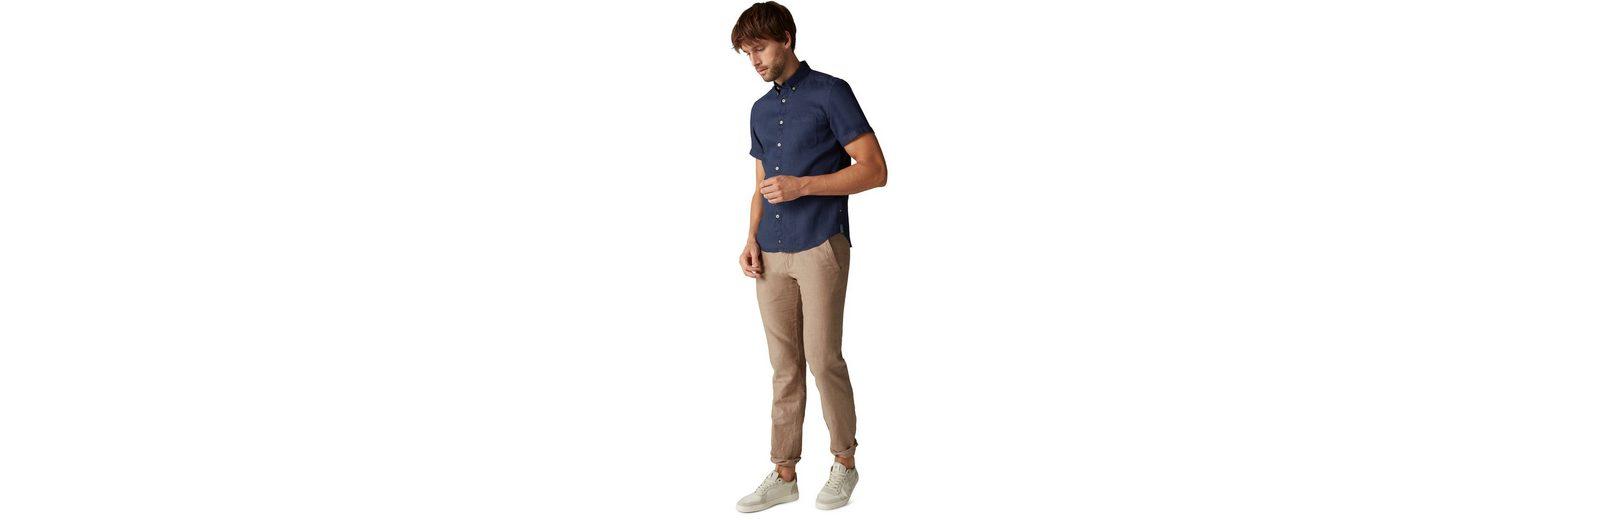 Marc O'Polo Kurzarmhemd Billig Online-Shop Manchester dpTCtxq8f